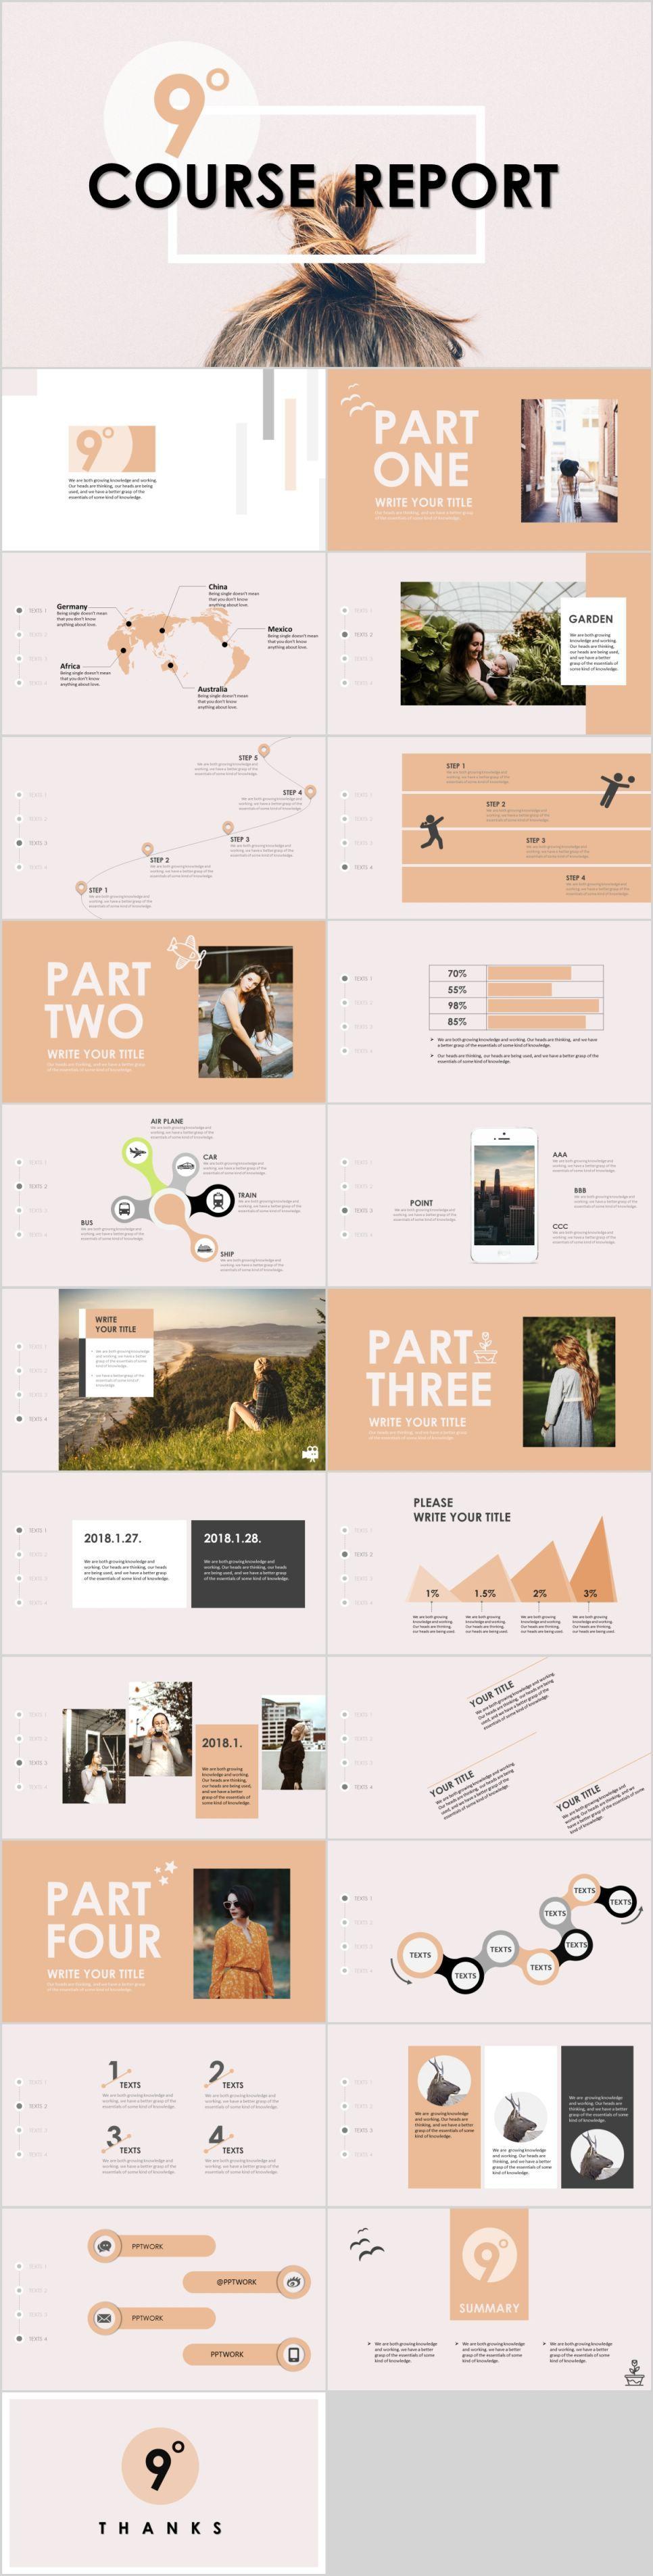 24+ garment company analysis report PowerPoint template | Pinterest ...